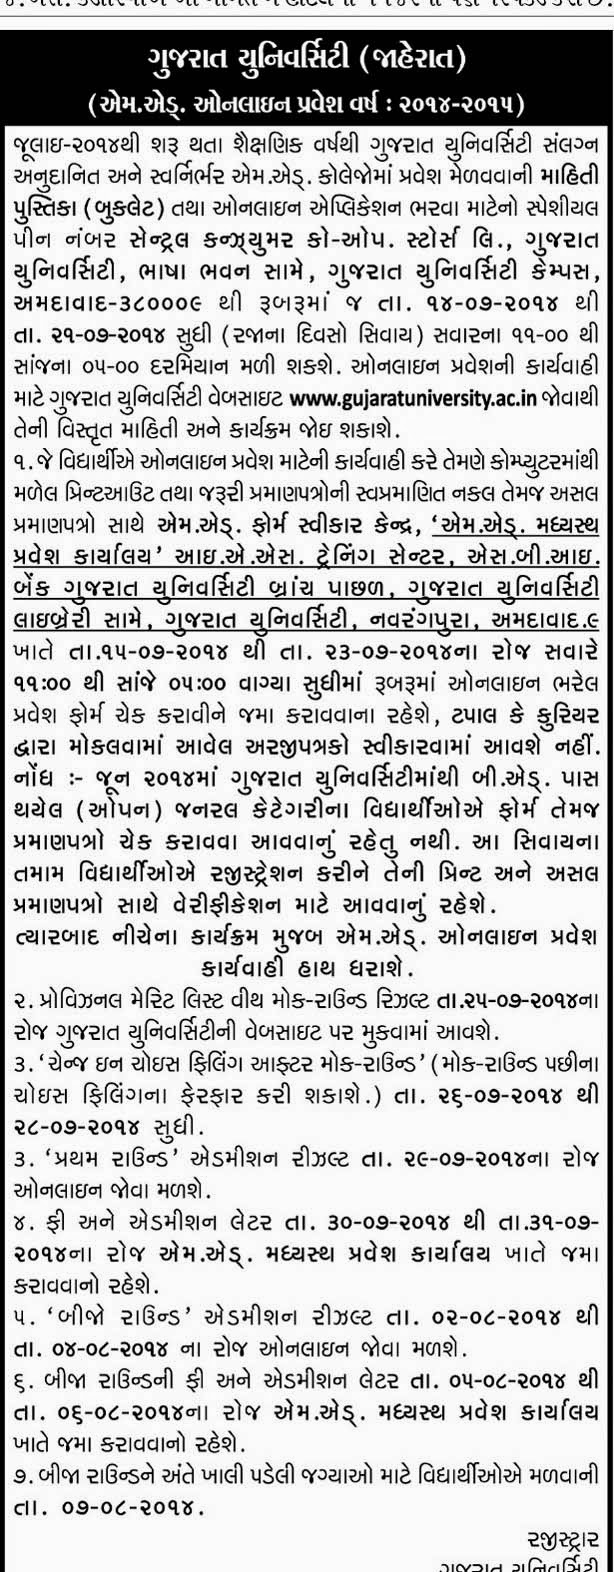 Gujarat University M.Ed online Admission 2014-15